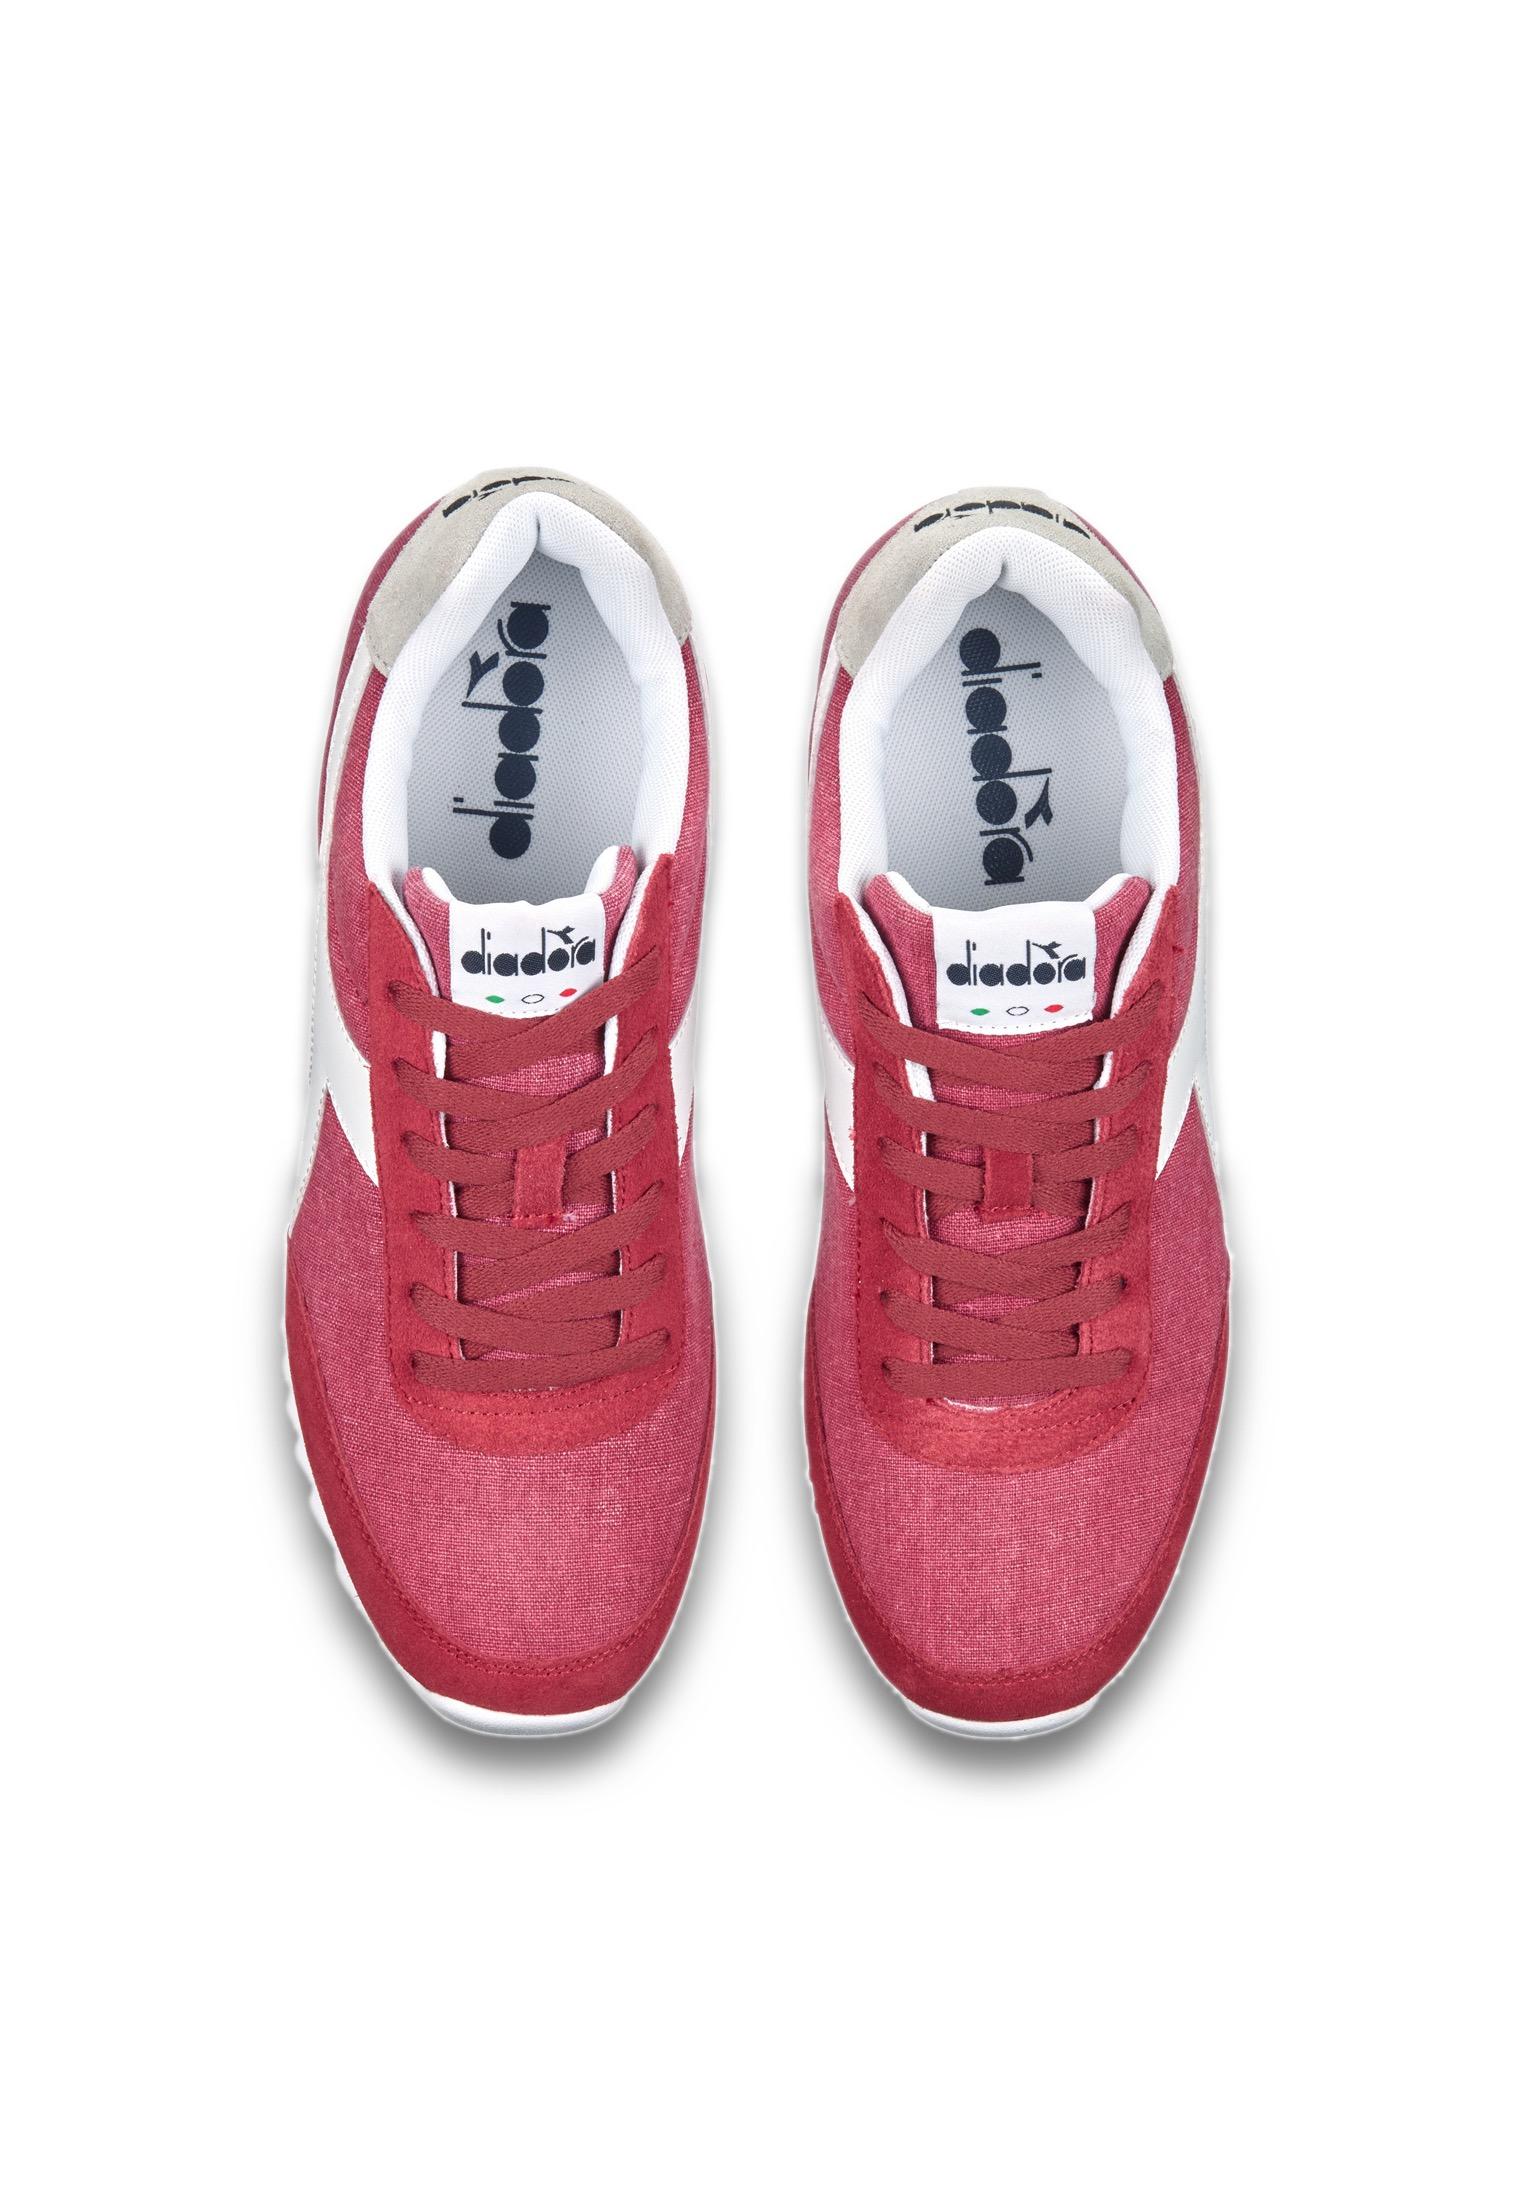 Scarpe-Diadora-Jog-Light-C-Sneakers-sportive-uomo-donna-vari-colori-e-taglie miniatura 4